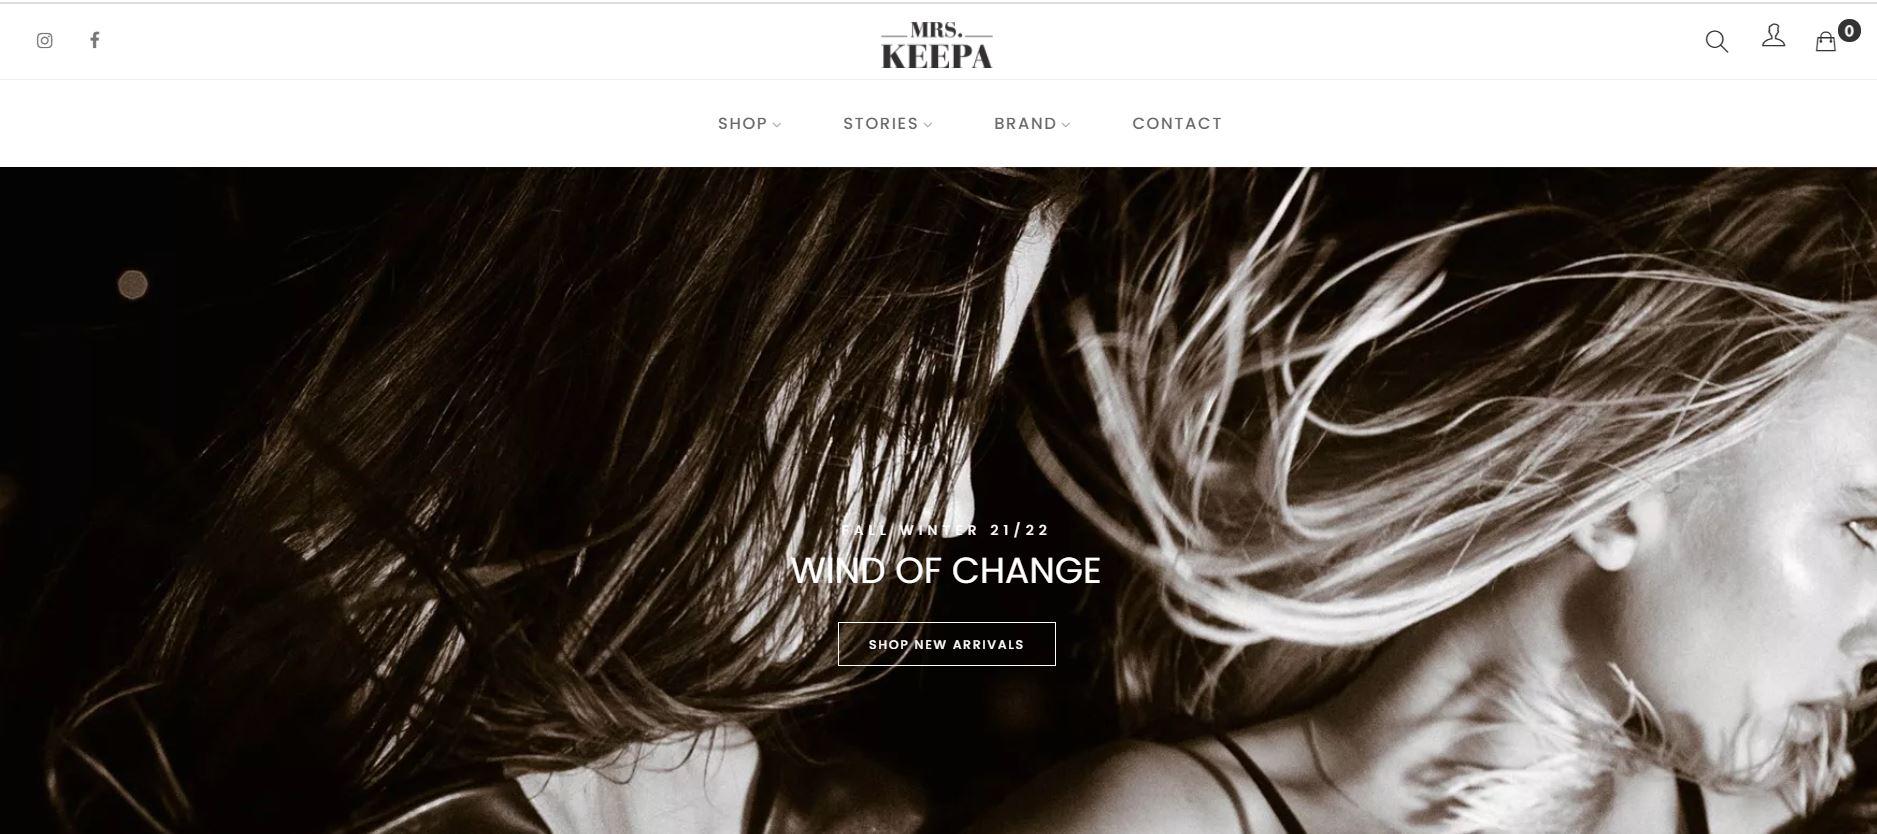 mrskeepa.com - Website Creation